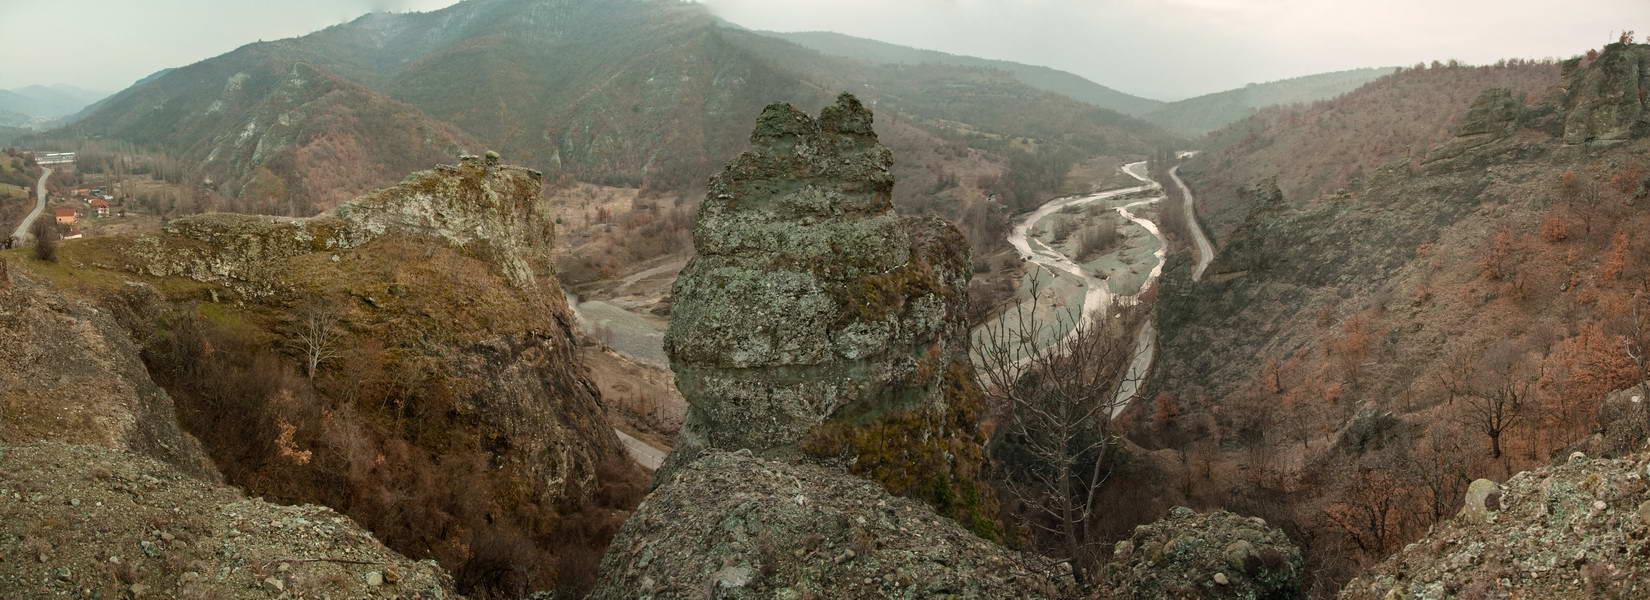 Dolina Pčinje sa Vražjeg kamena